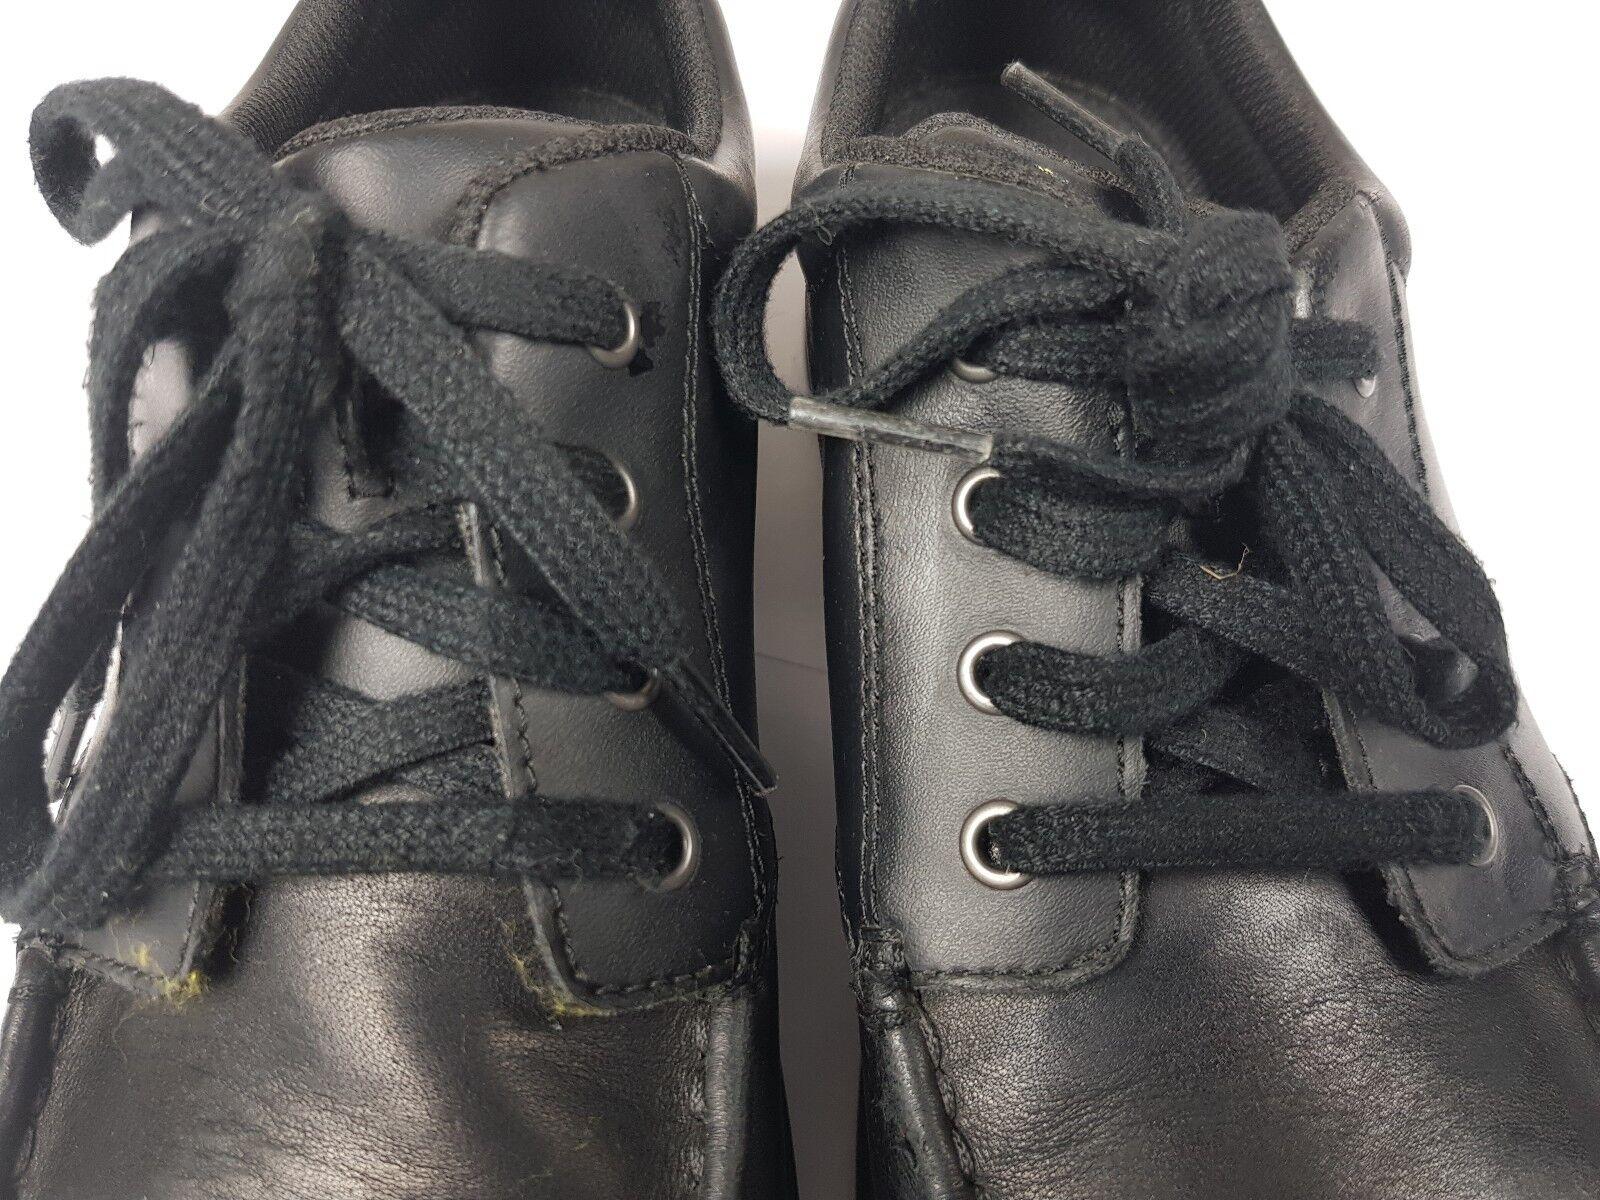 BOOTLEG Black Lace-up Mens Boys Leather Shoes - UK 7 / EU 41 Excellent Cond